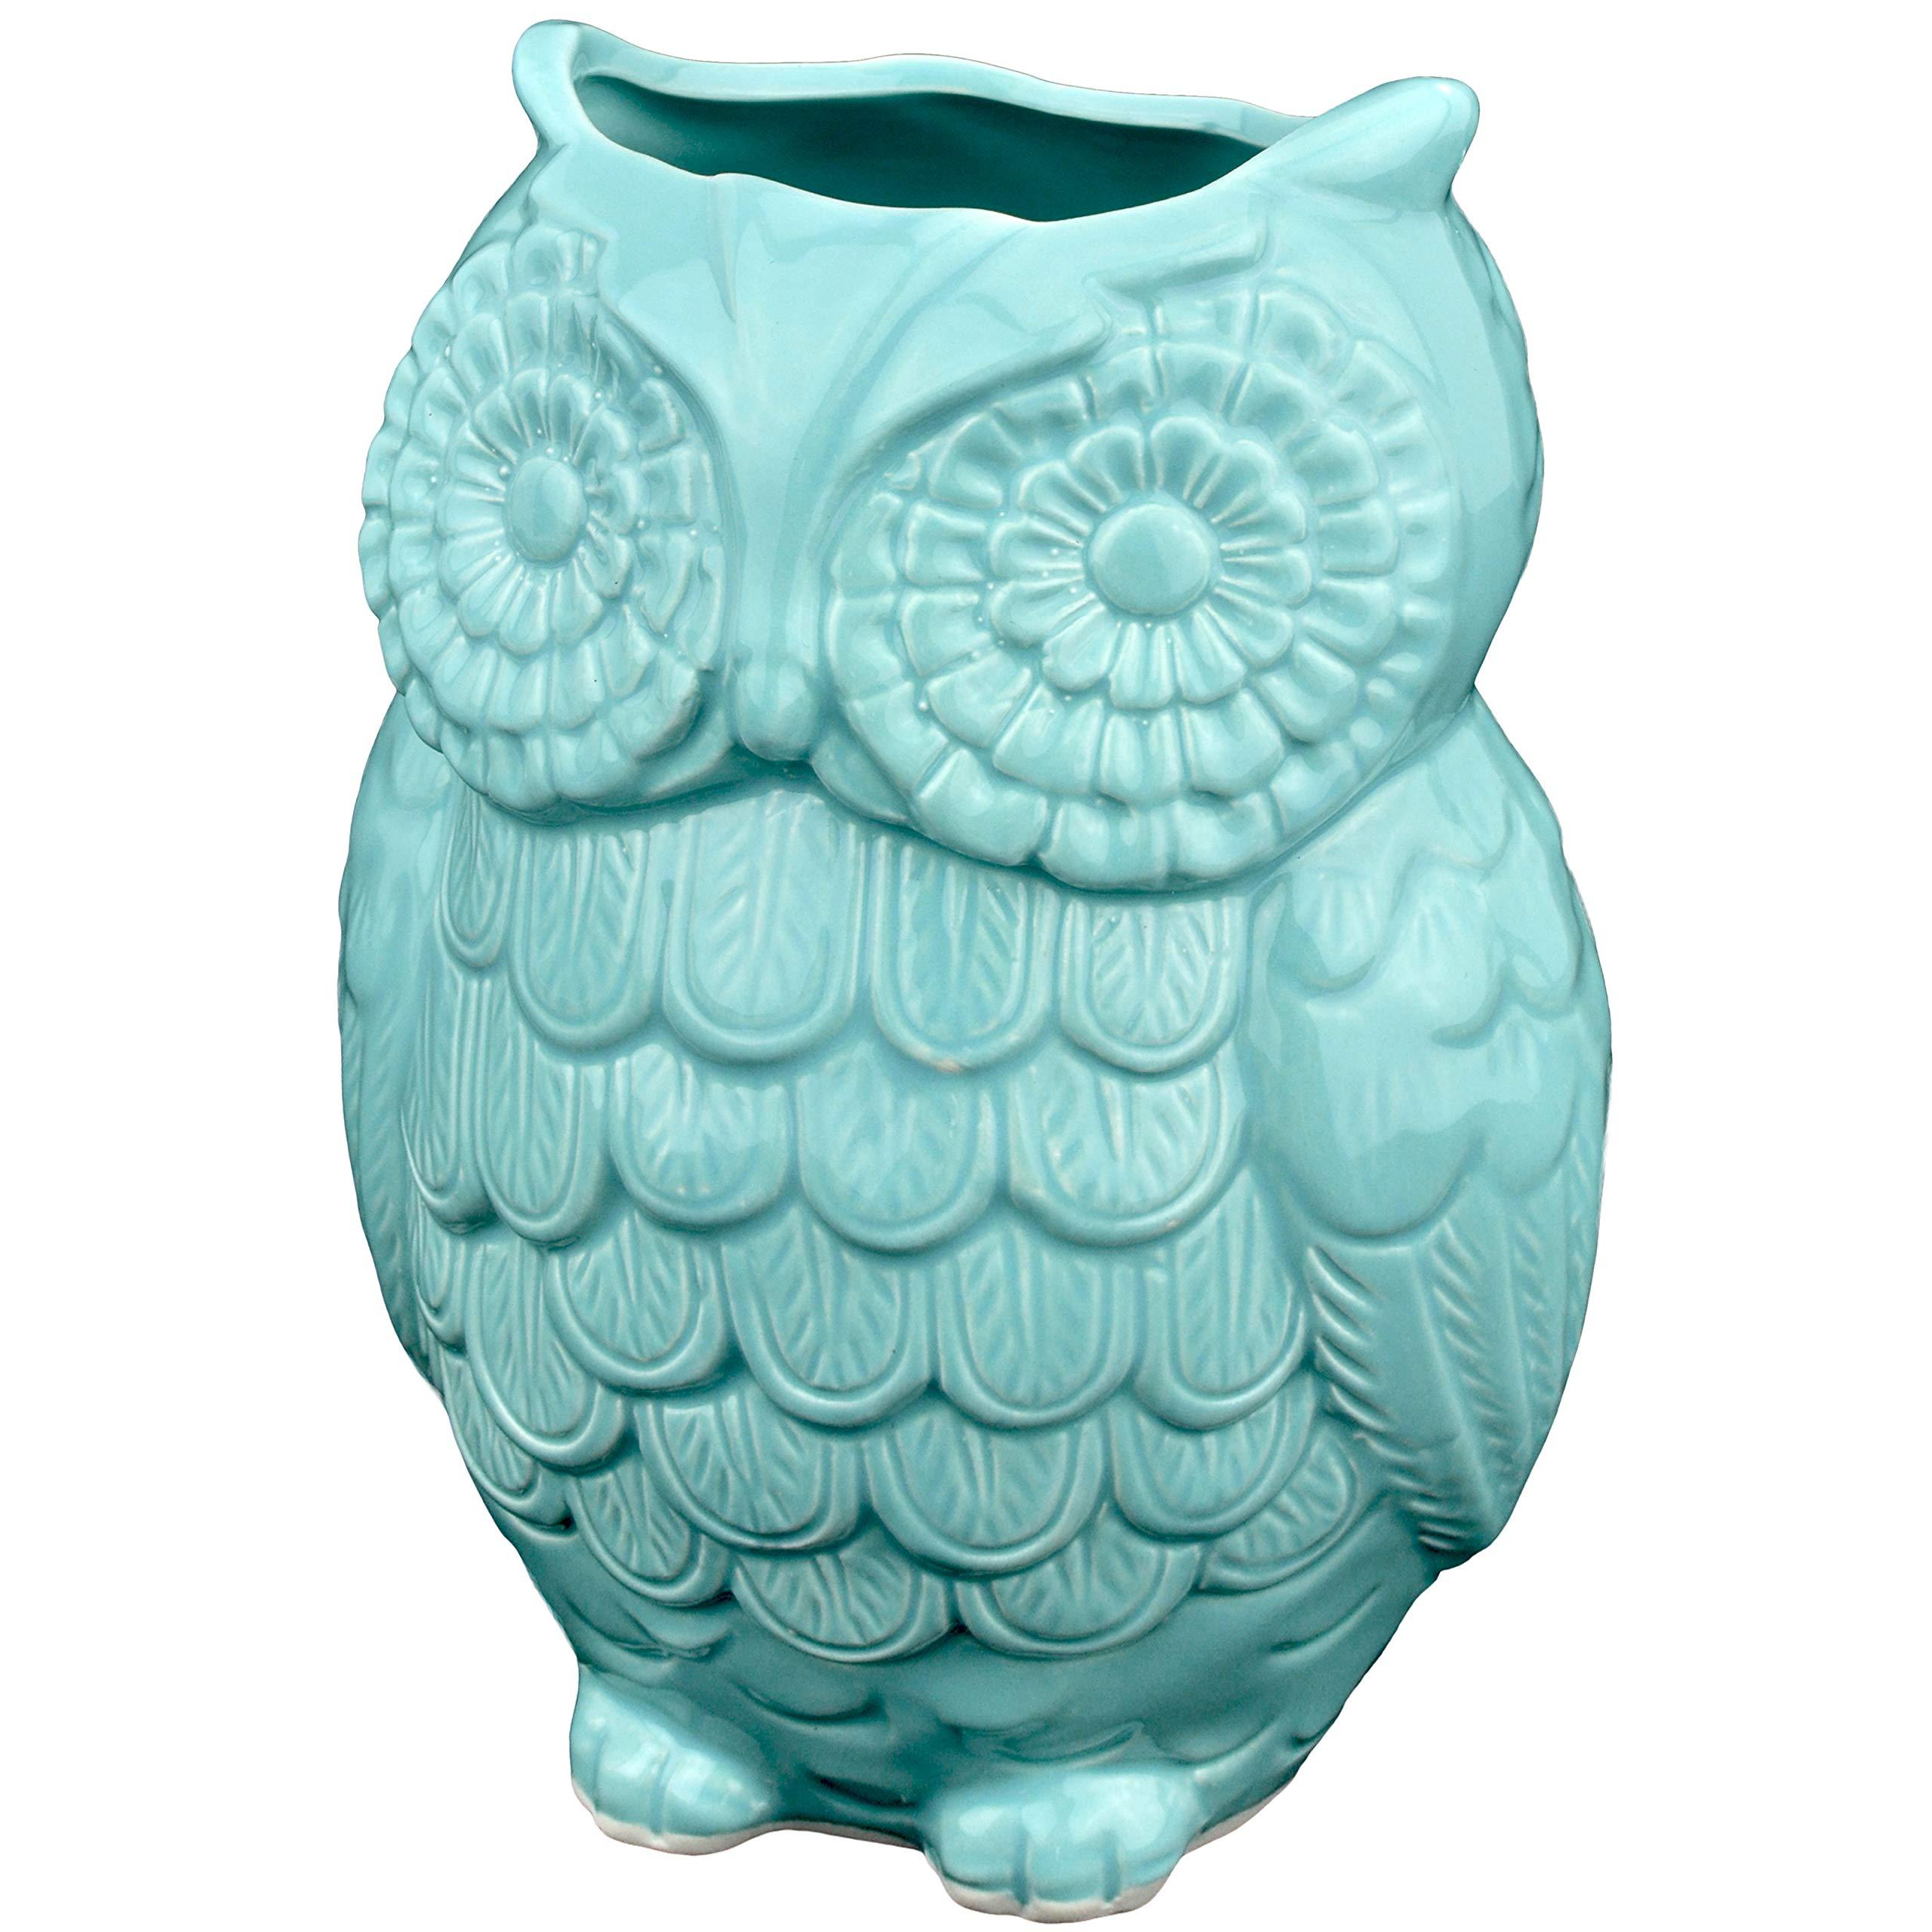 MyGift Aqua Blue Owl Design Ceramic Cooking Utensil Holder/Multipurpose Kitchen Storage Crock by MyGift